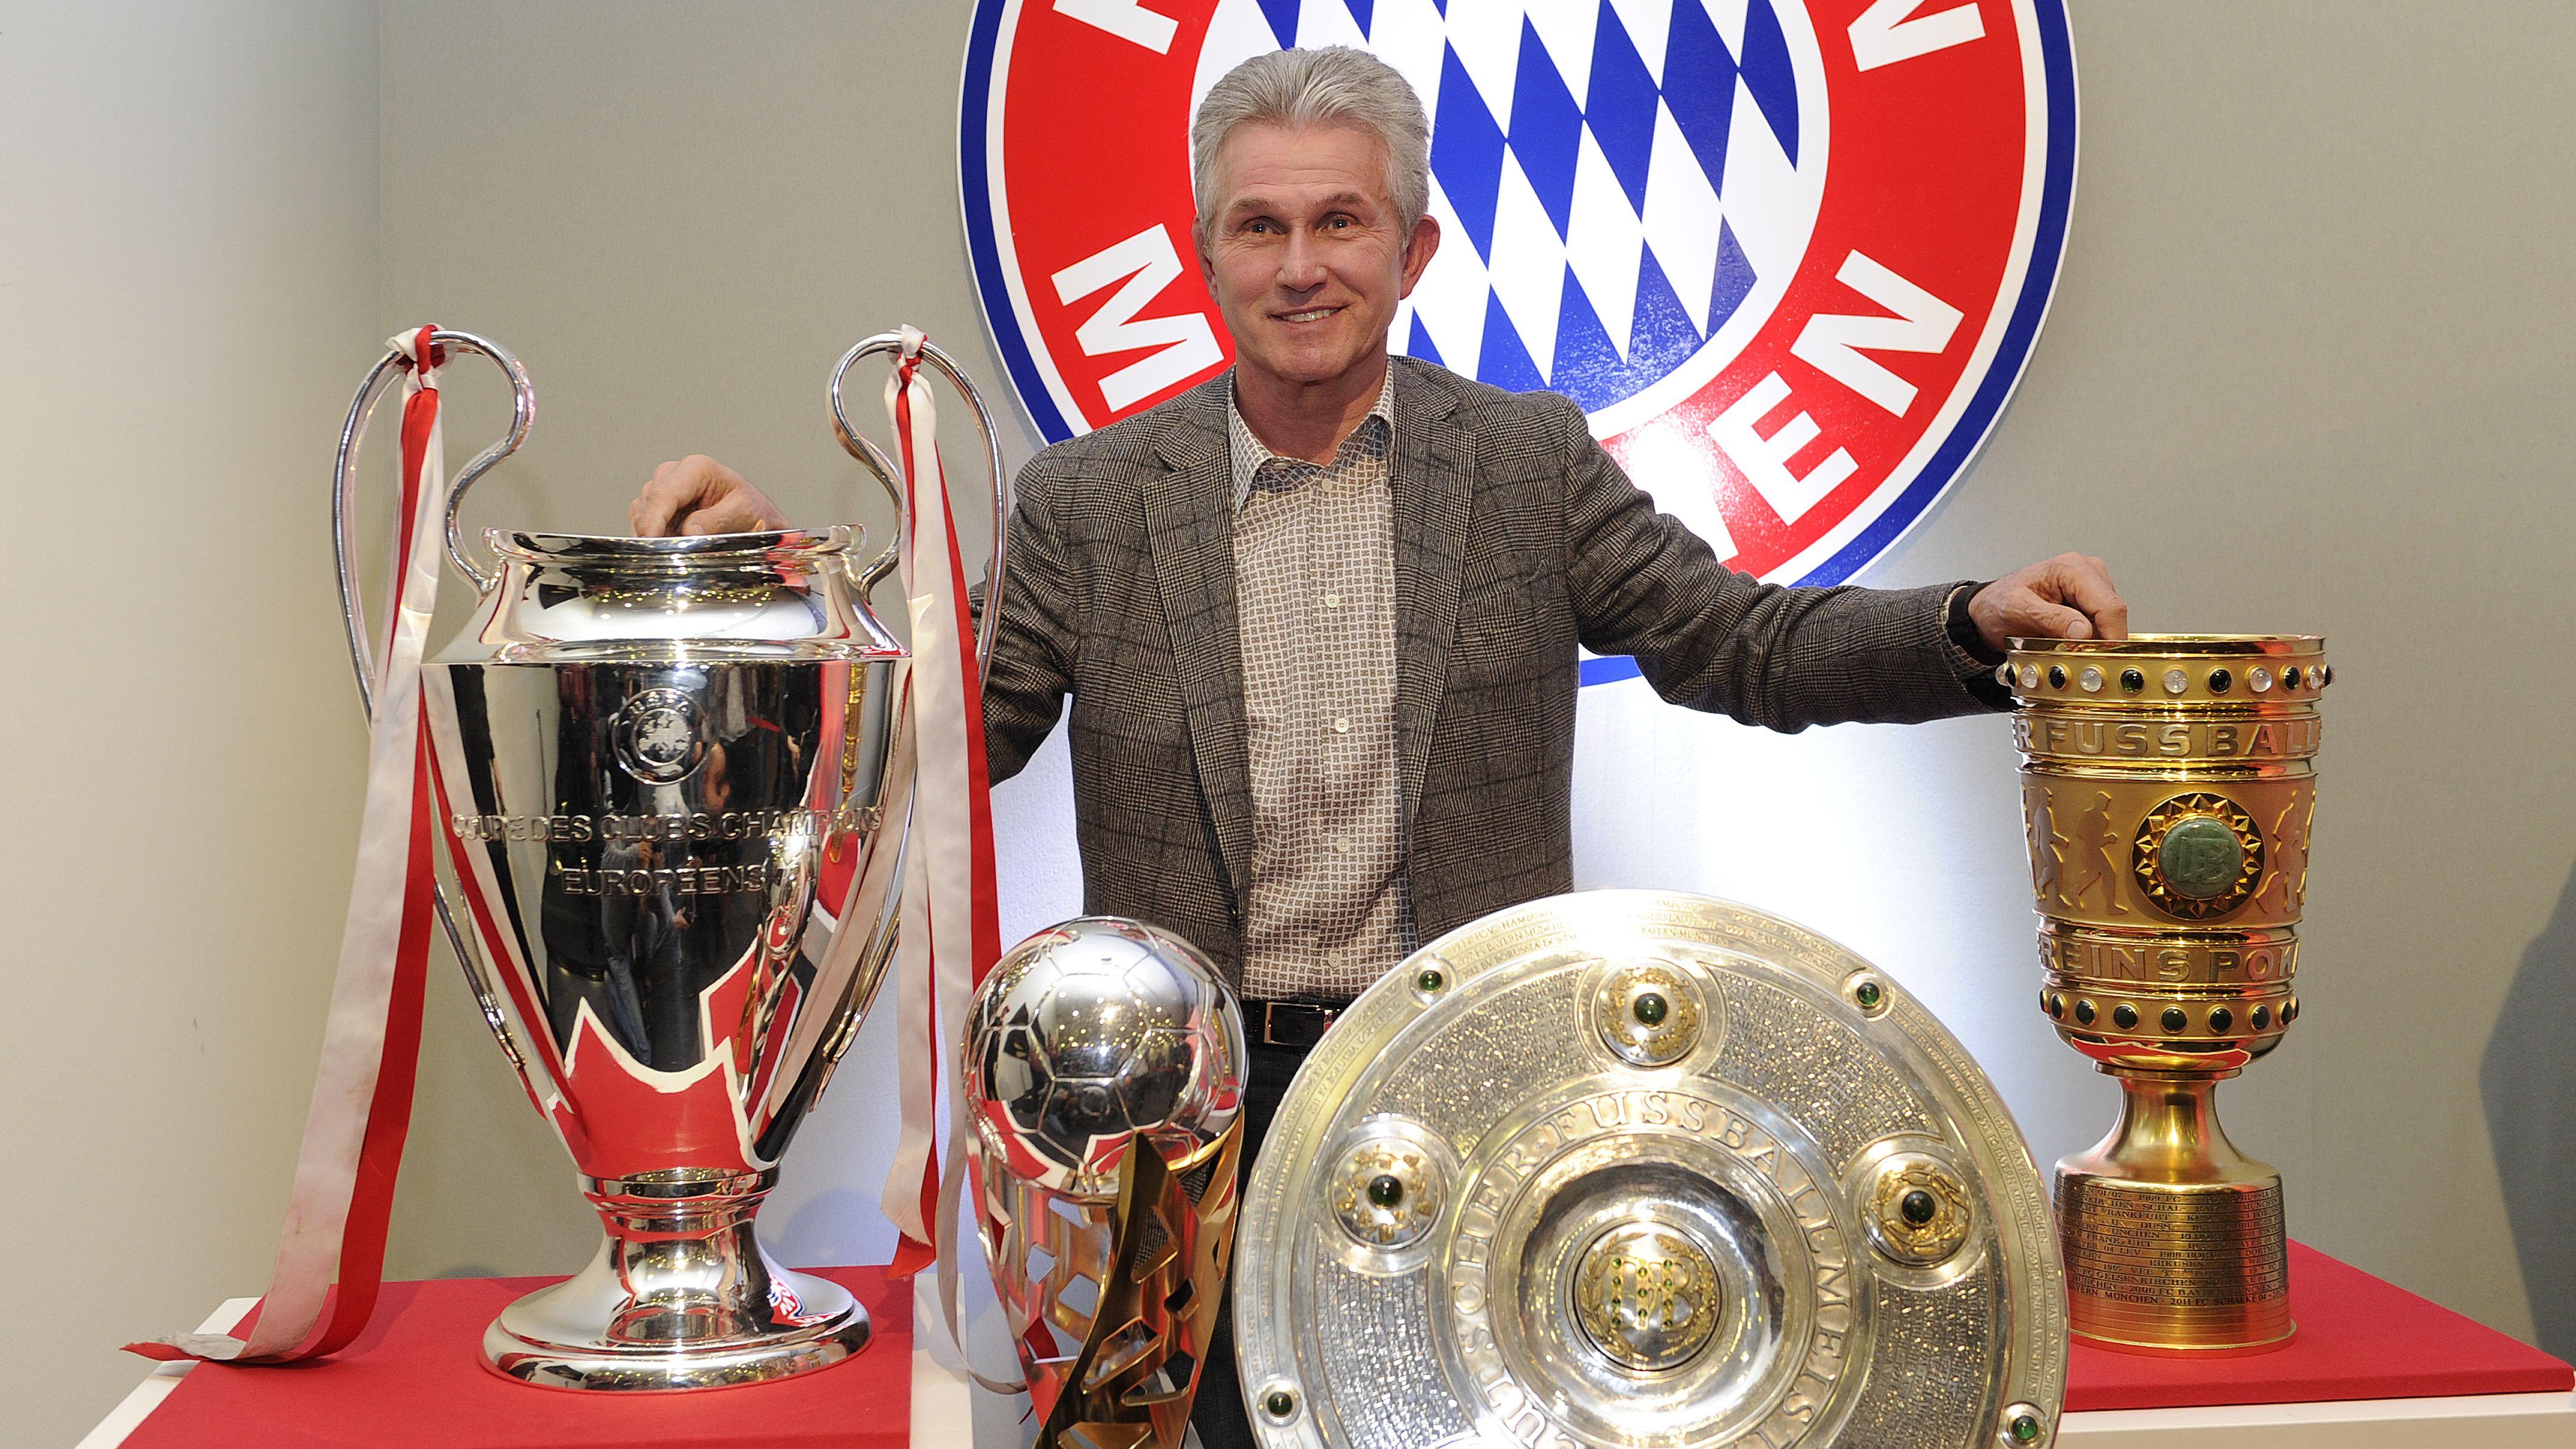 Jupp Heynckes 2013 mit Champions-League-Pokal,  DFL-Supercup, Meisterschale und DFB-Pokal